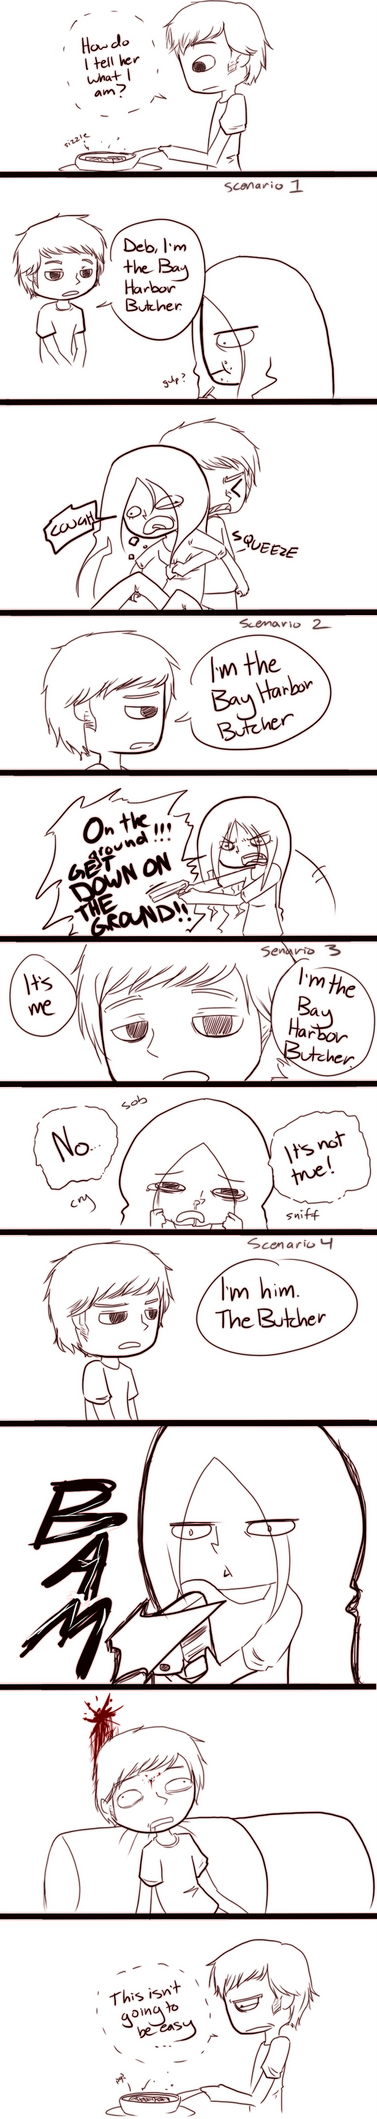 Dexter Comic by vSock